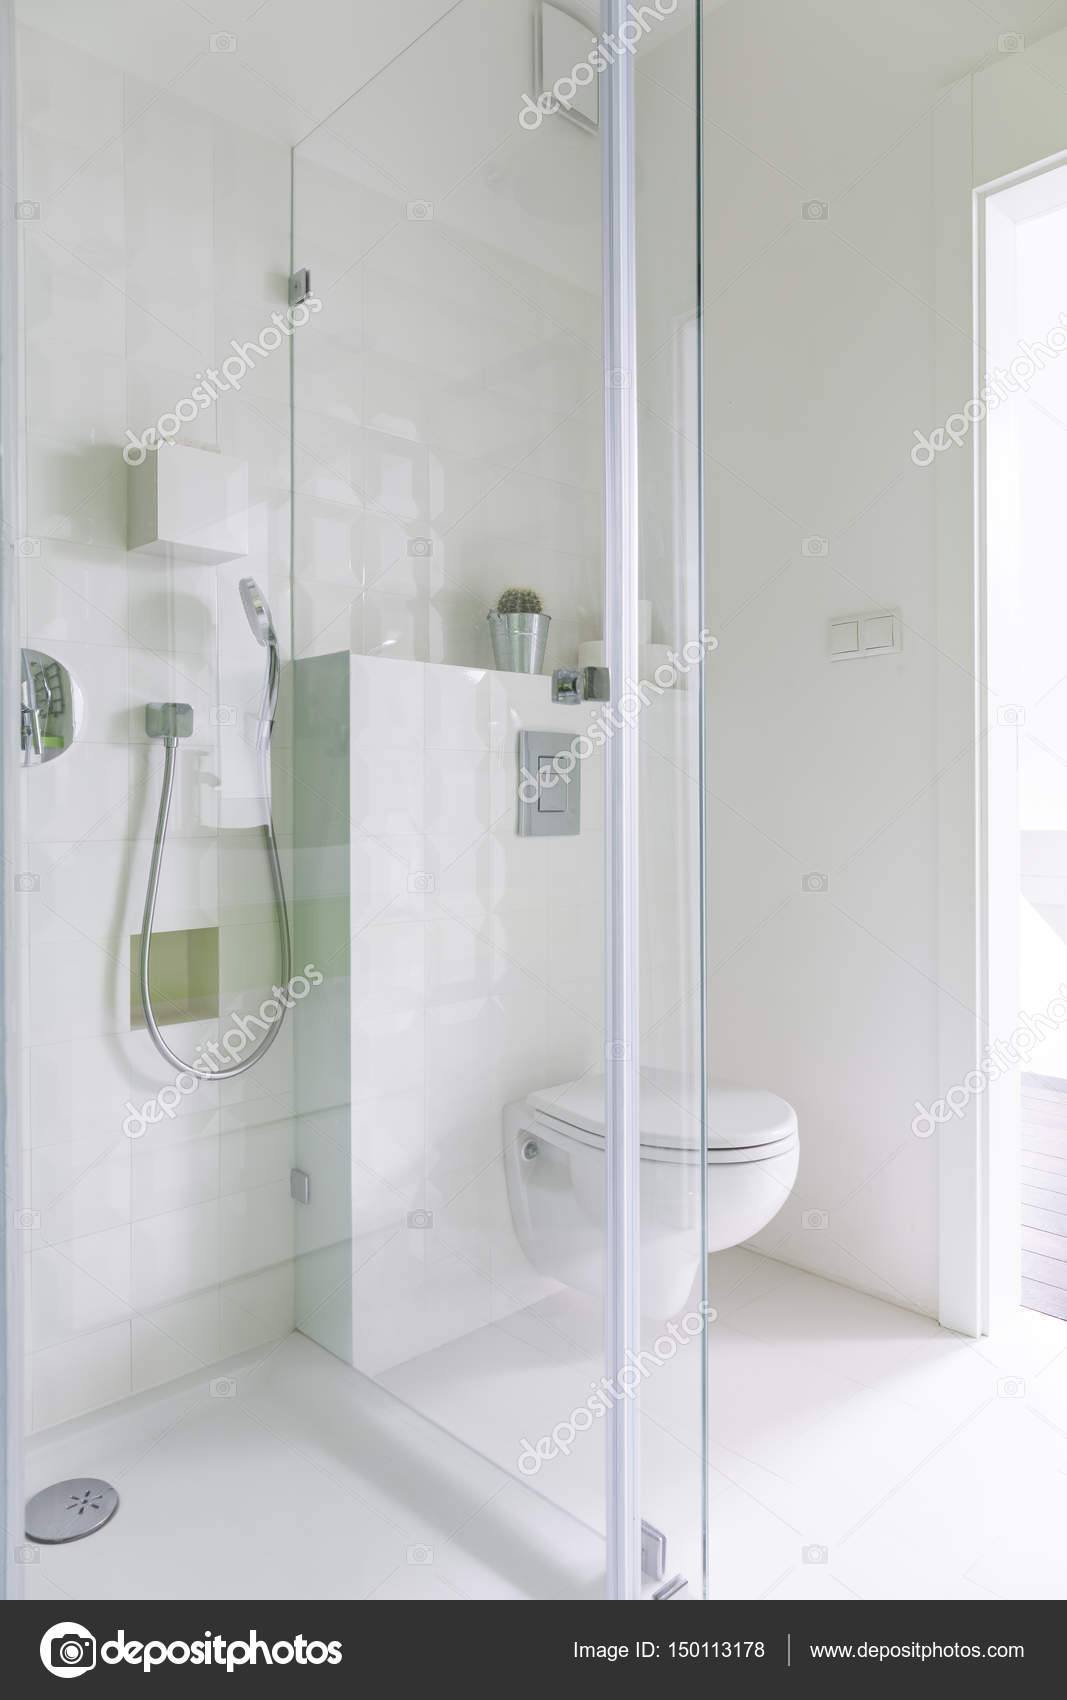 Bathroom with glazed shower — Stock Photo © photographee.eu #150113178